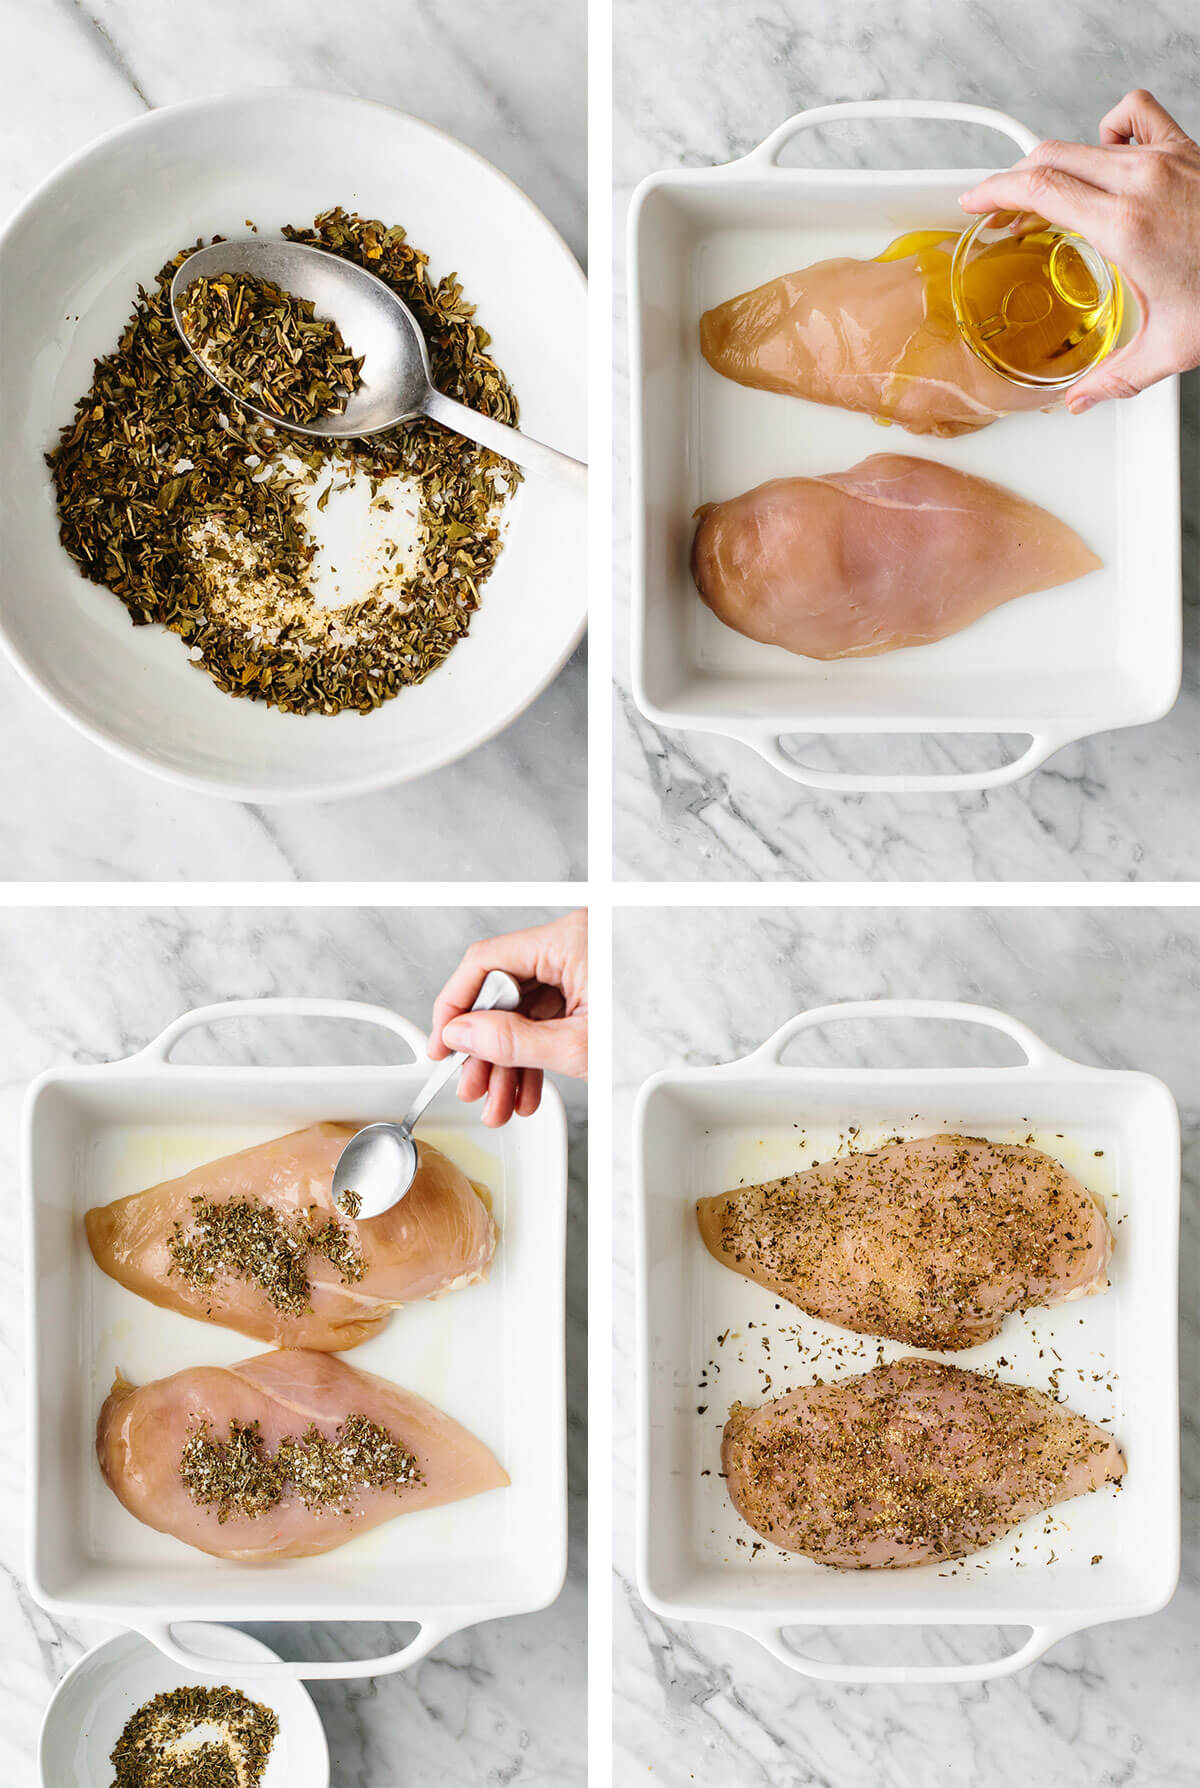 Adding herb seasoning onto herb baked chicken breasts.